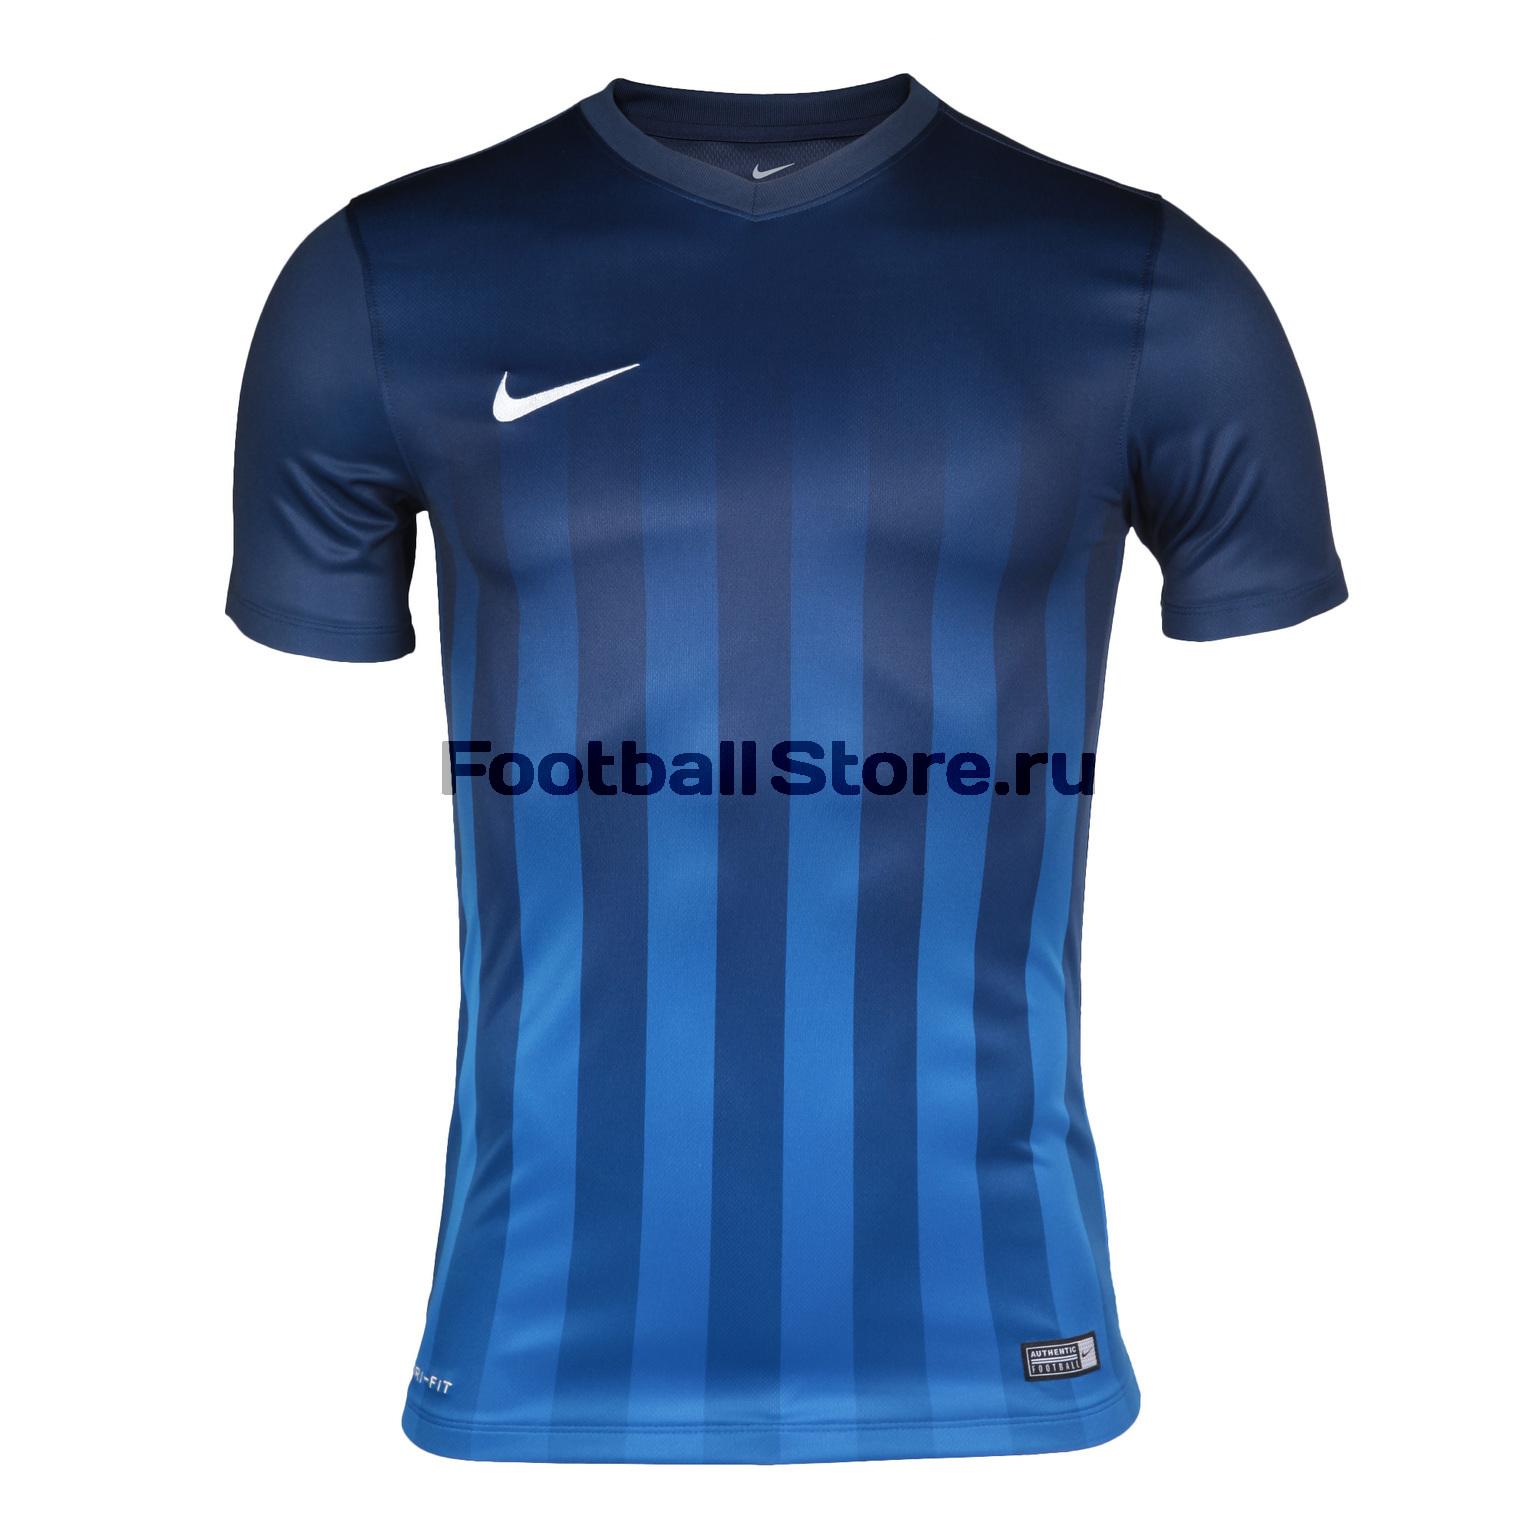 Футболка Nike SS Striped Division II JSY 725893-410 nike nike precision ii ss jersey